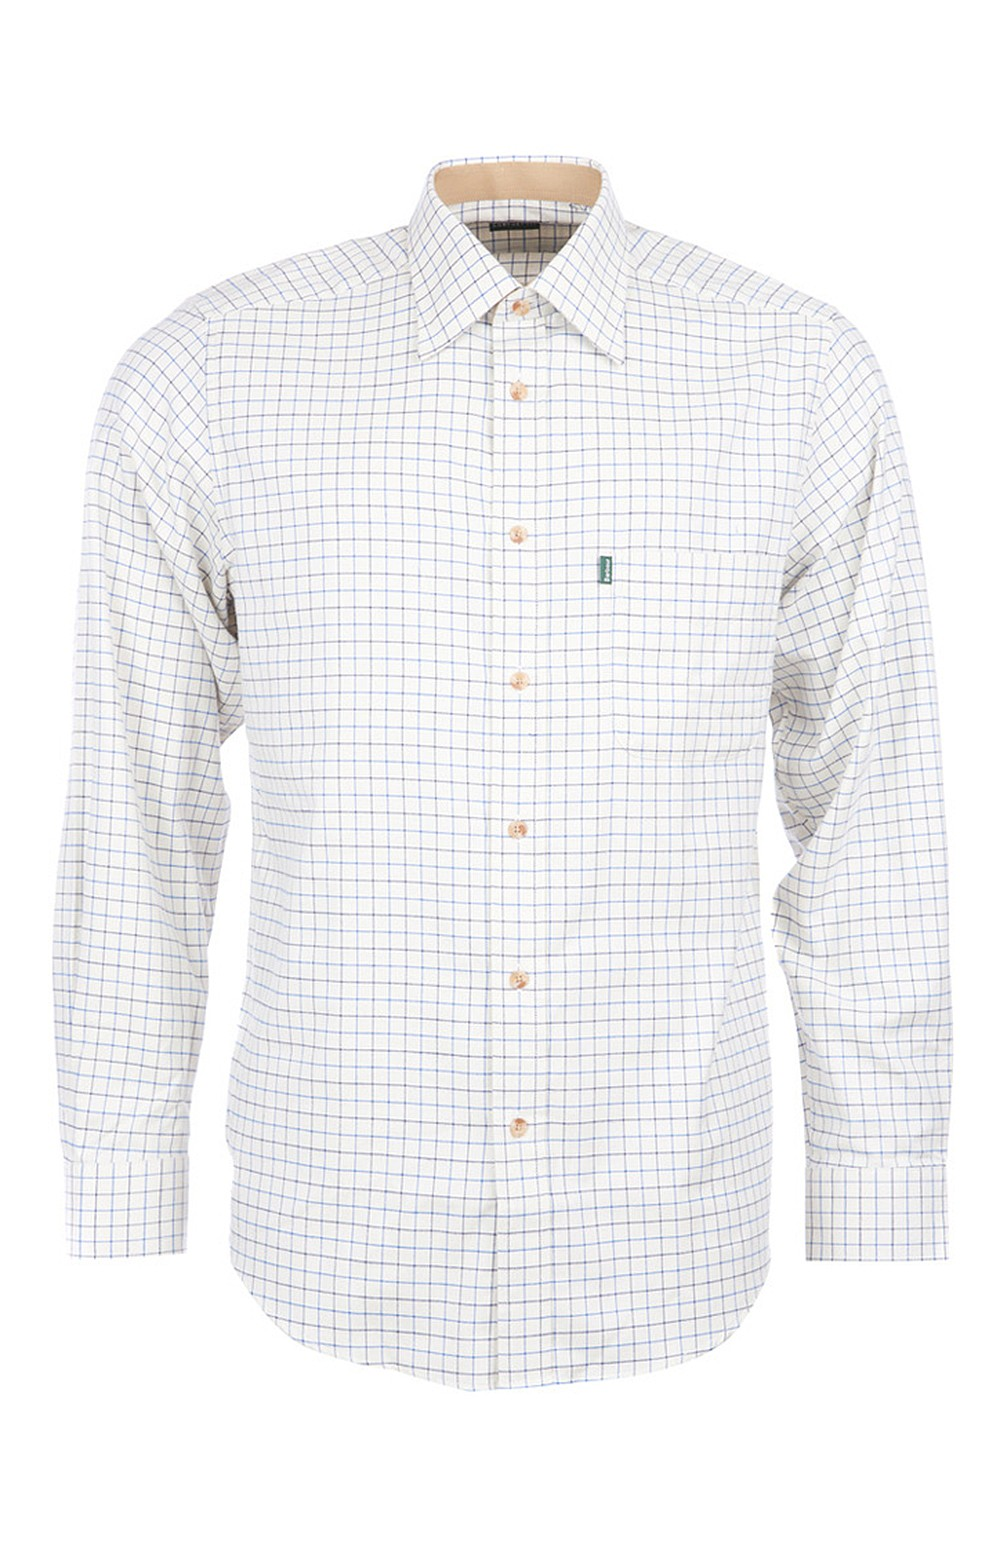 8d1561f6 Mens Barbour Field Tattersall Shirt | Men's Sporting Shirts | House Of Bruar